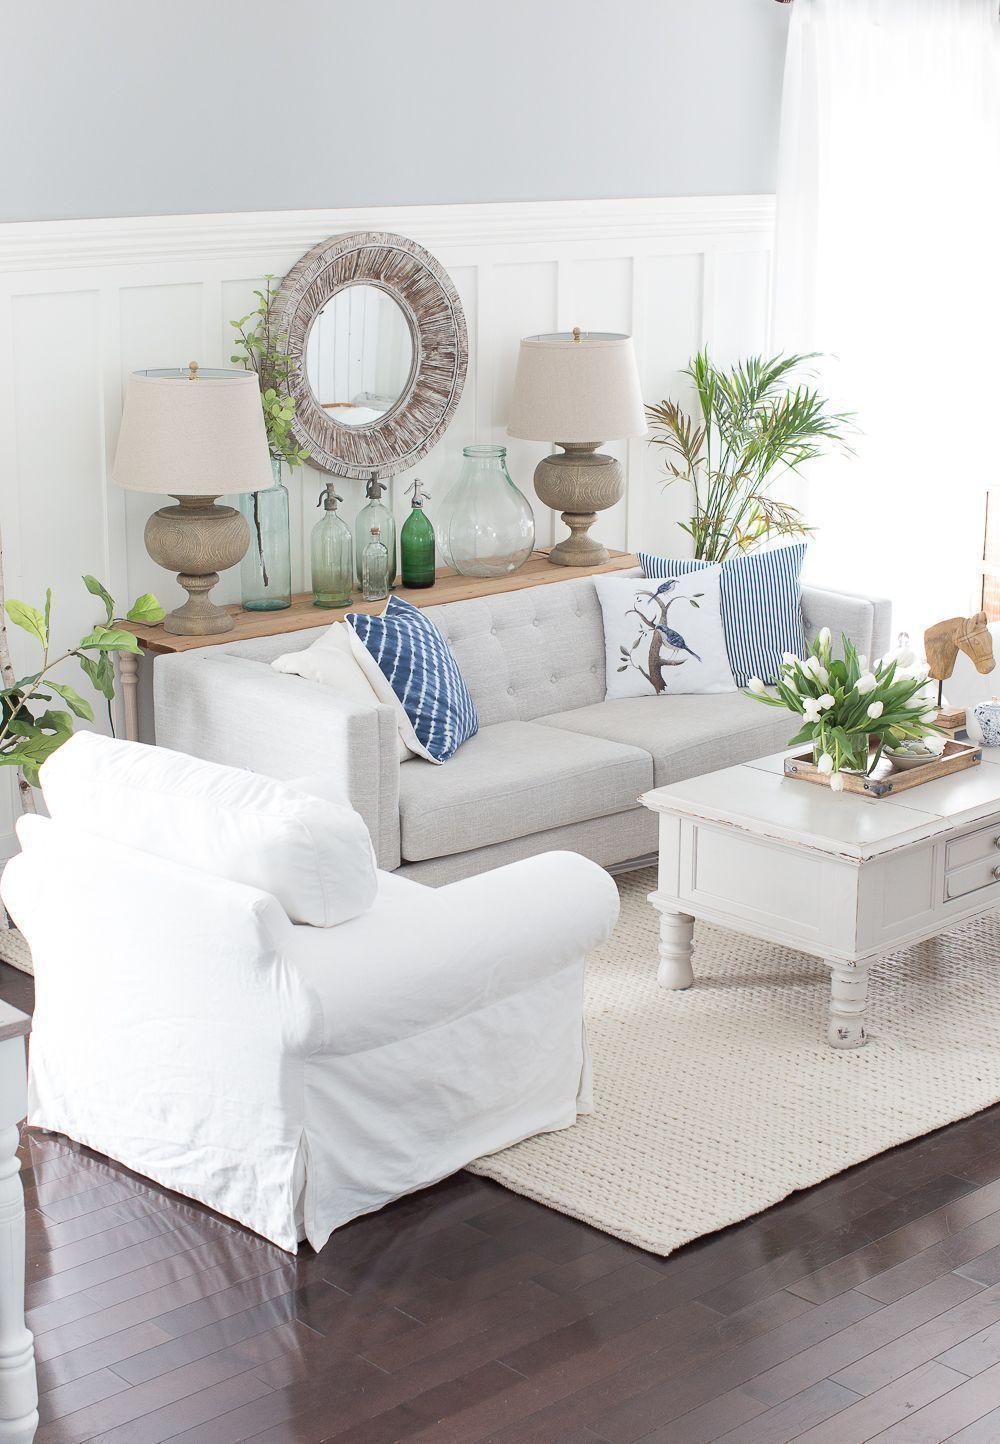 Small Living Room Ideas On A Budget: 123 Inspiring Small Living Room Decorating Ideas For